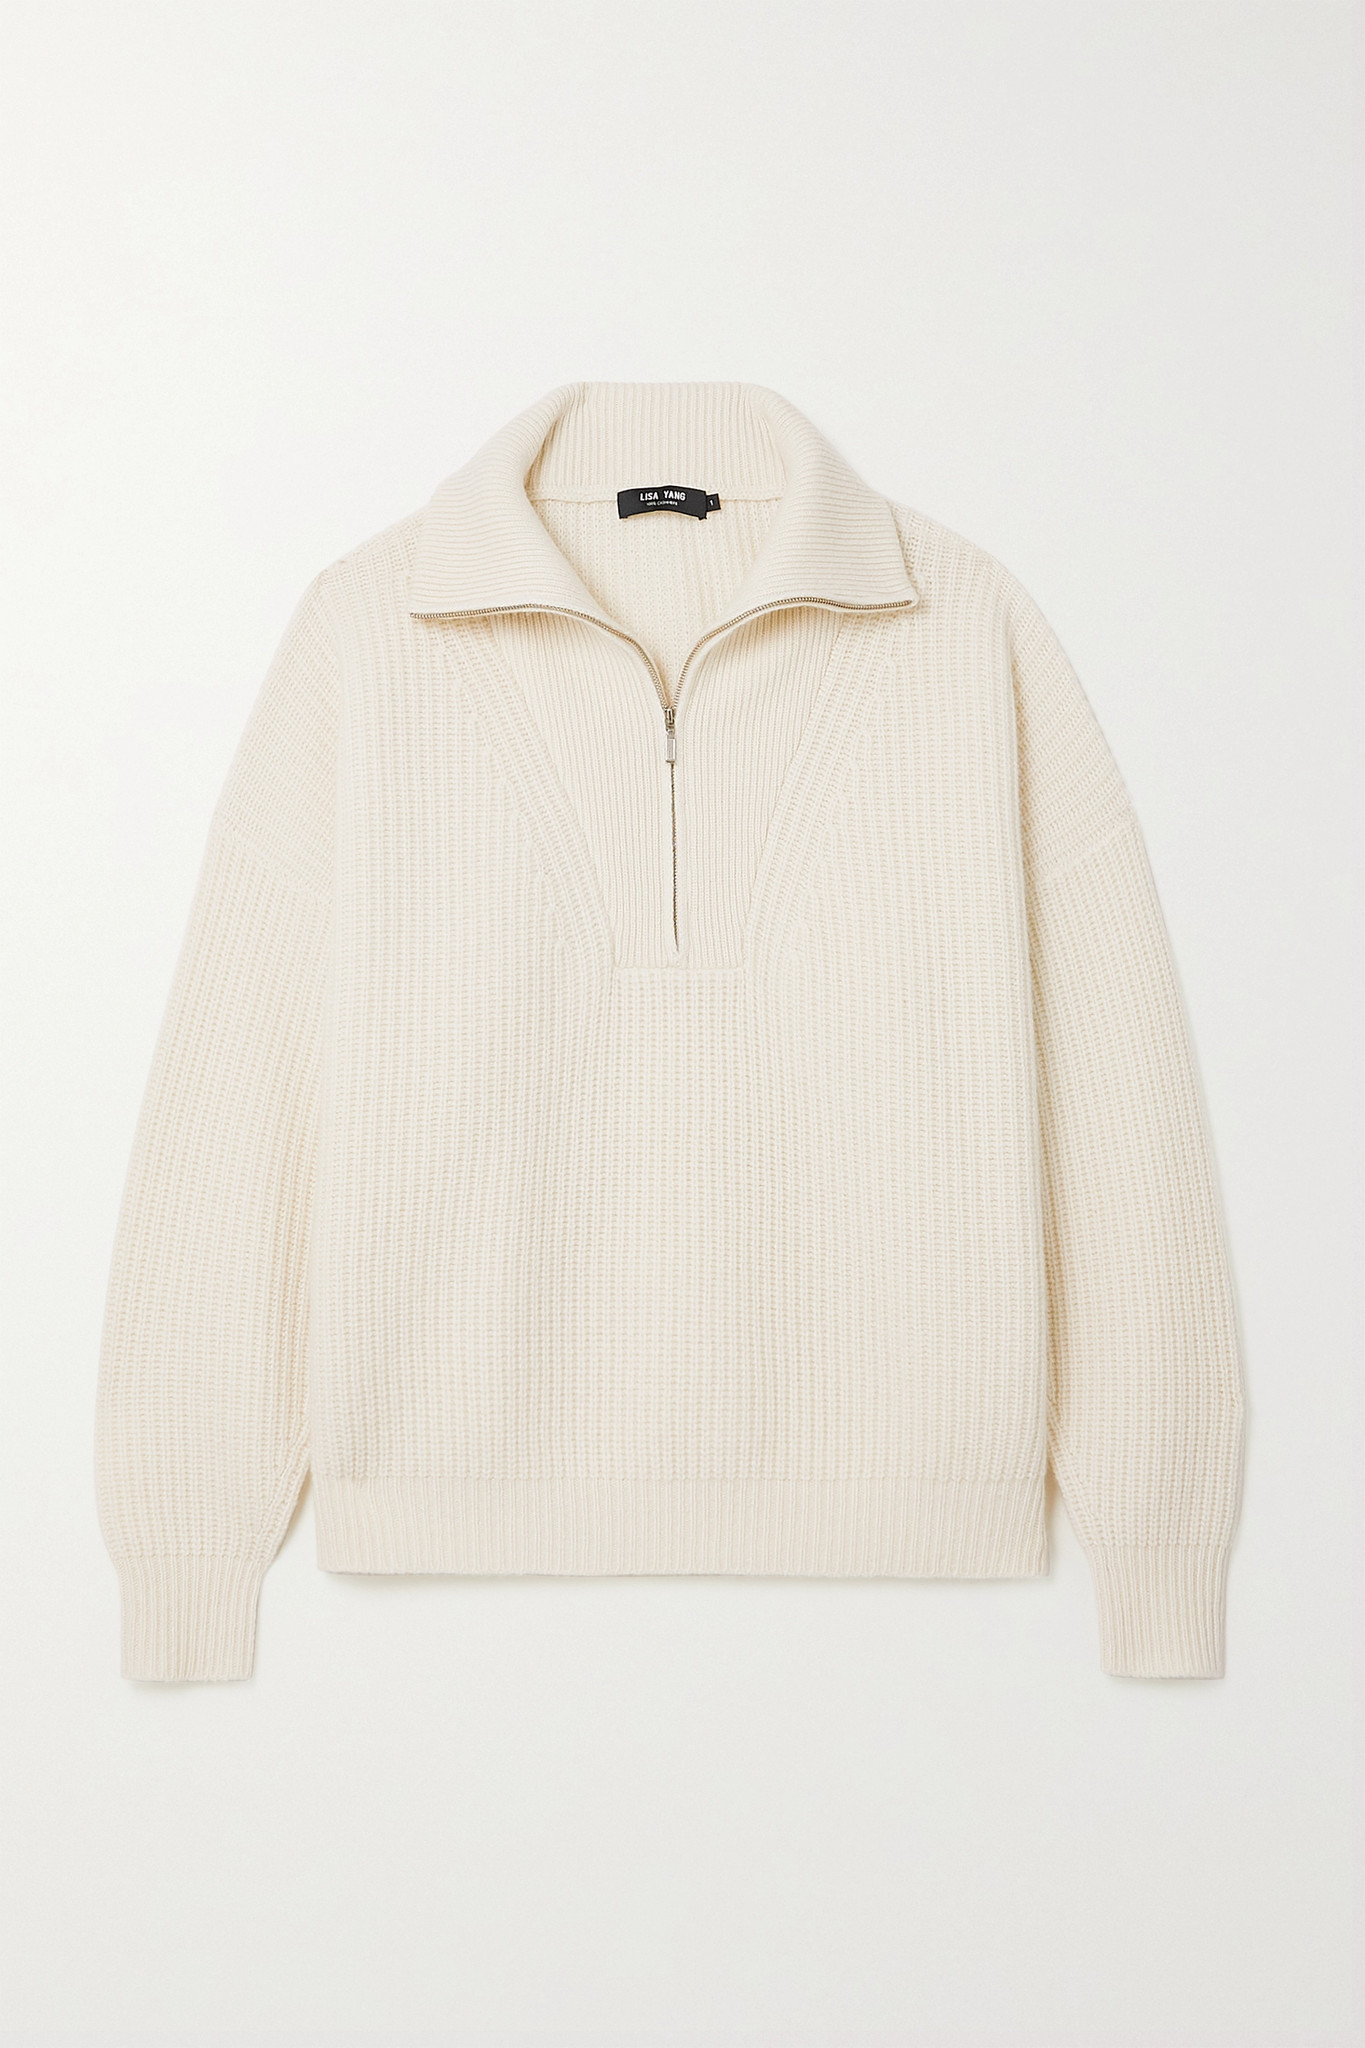 LISA YANG - Jimmy Ribbed Cashmere Half-zip Sweater - Cream - 1